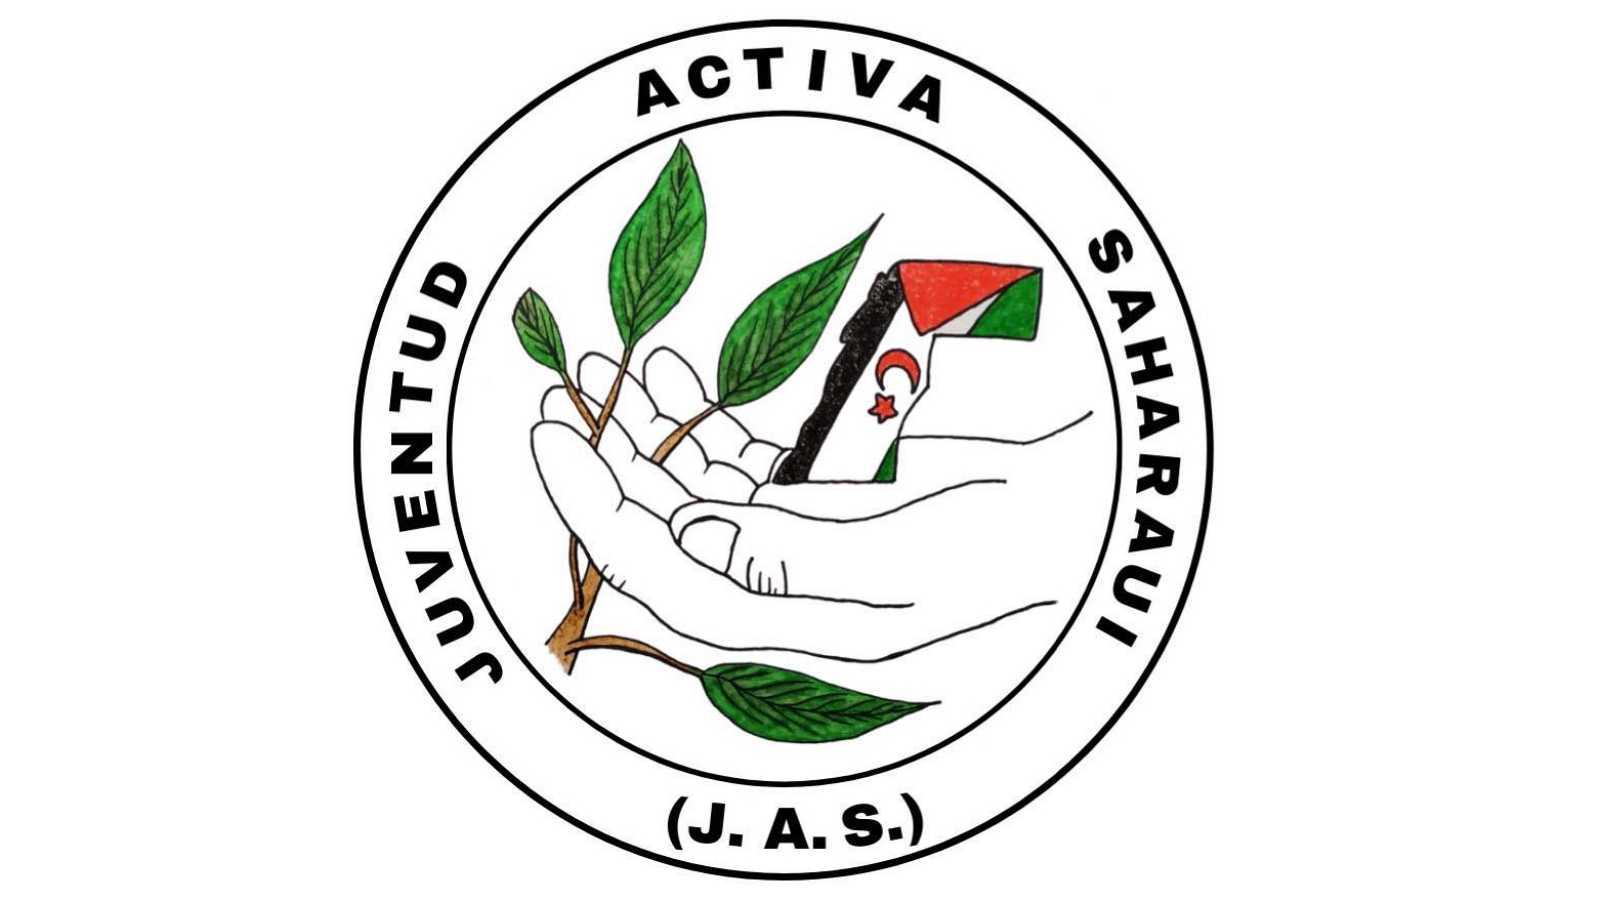 África hoy - Sáhara Occidental plataforma Juventud Activa Saharaui - 22/03/21 - escuchar ahora